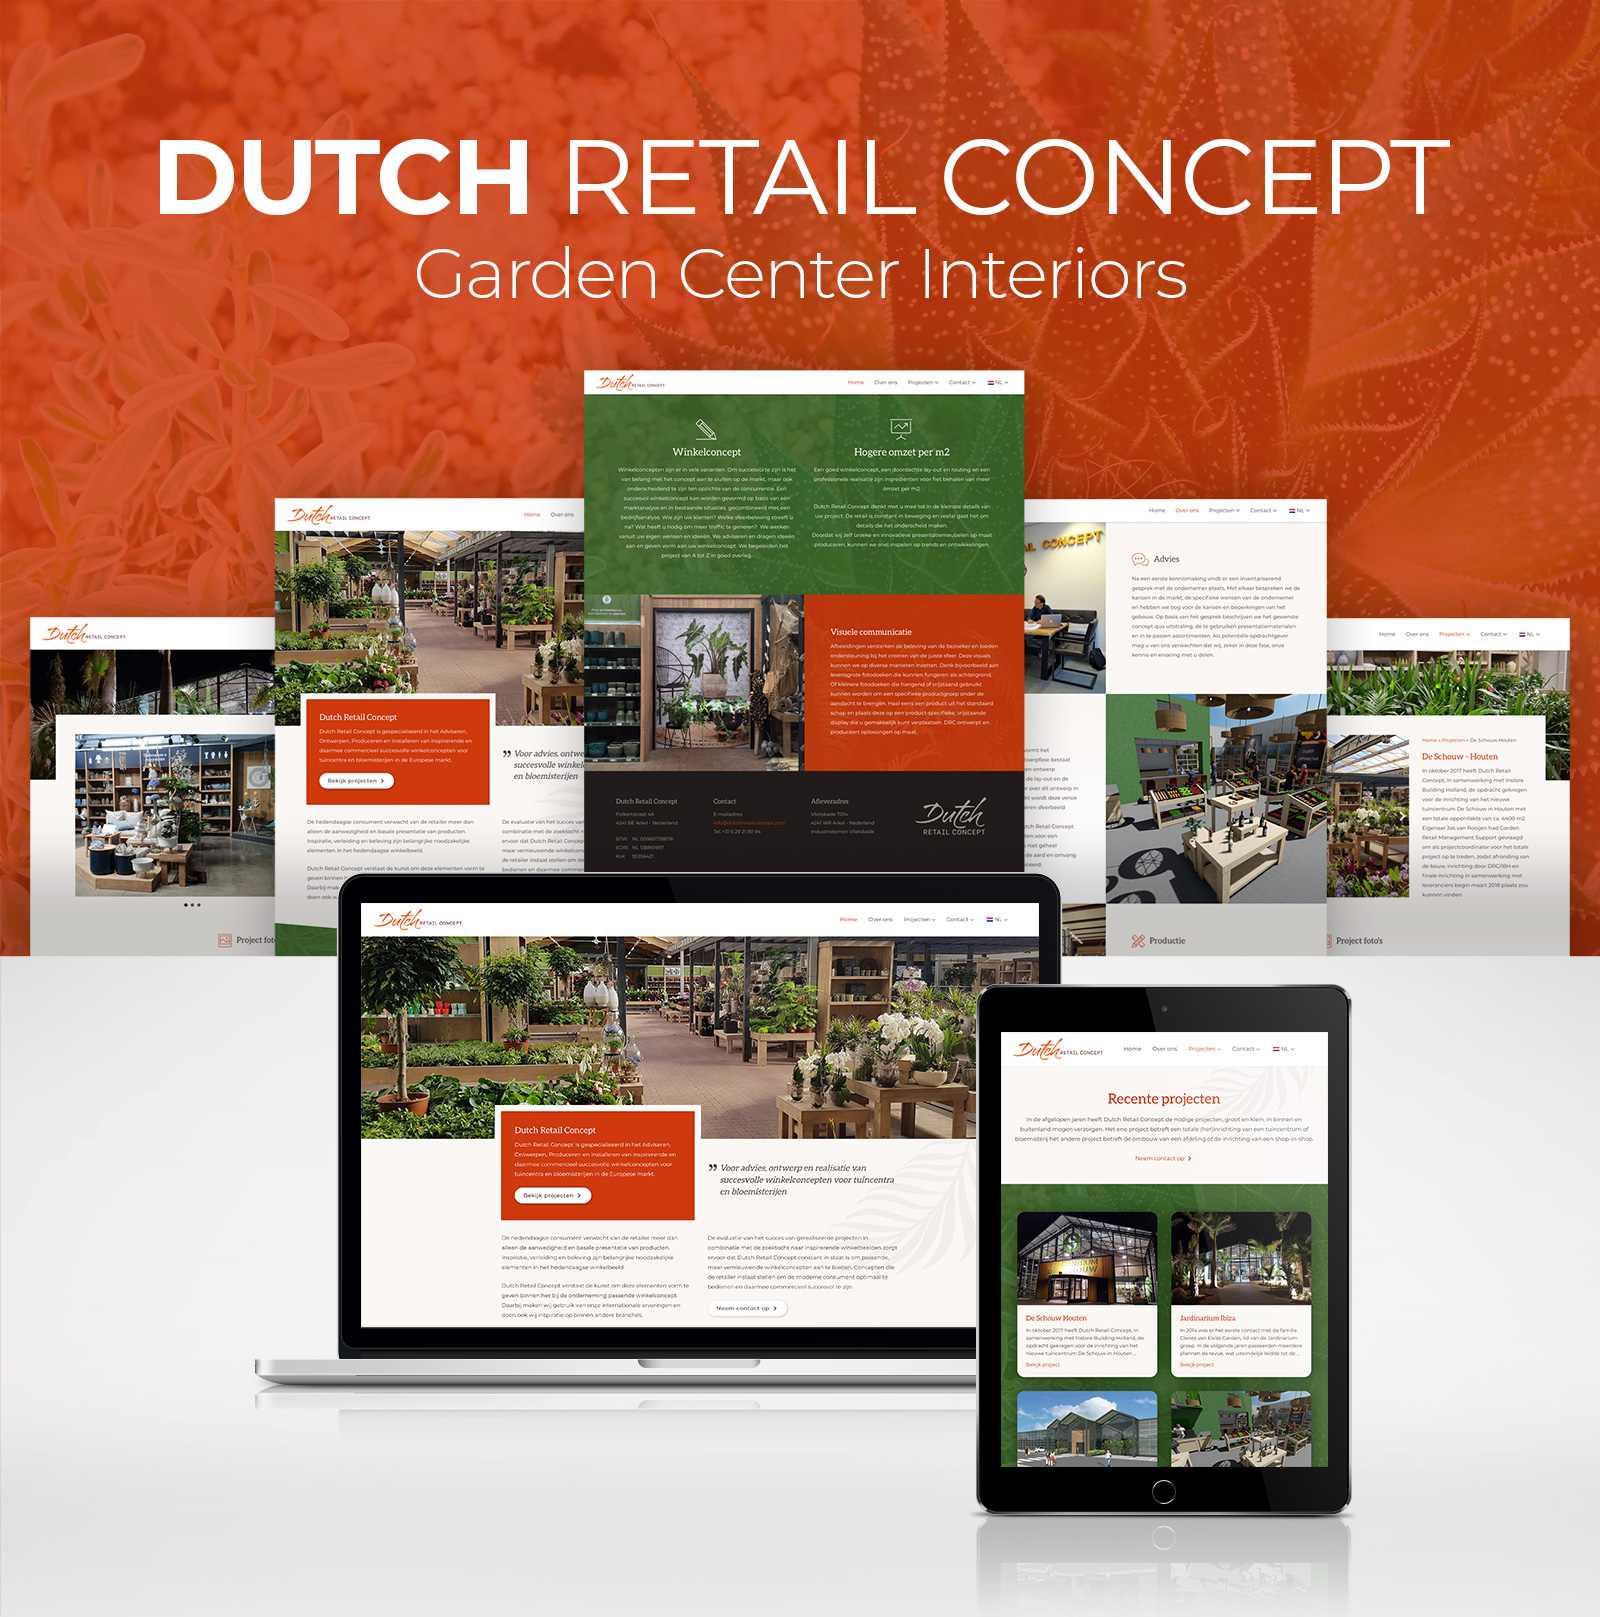 dutch-retail-concept-thumb